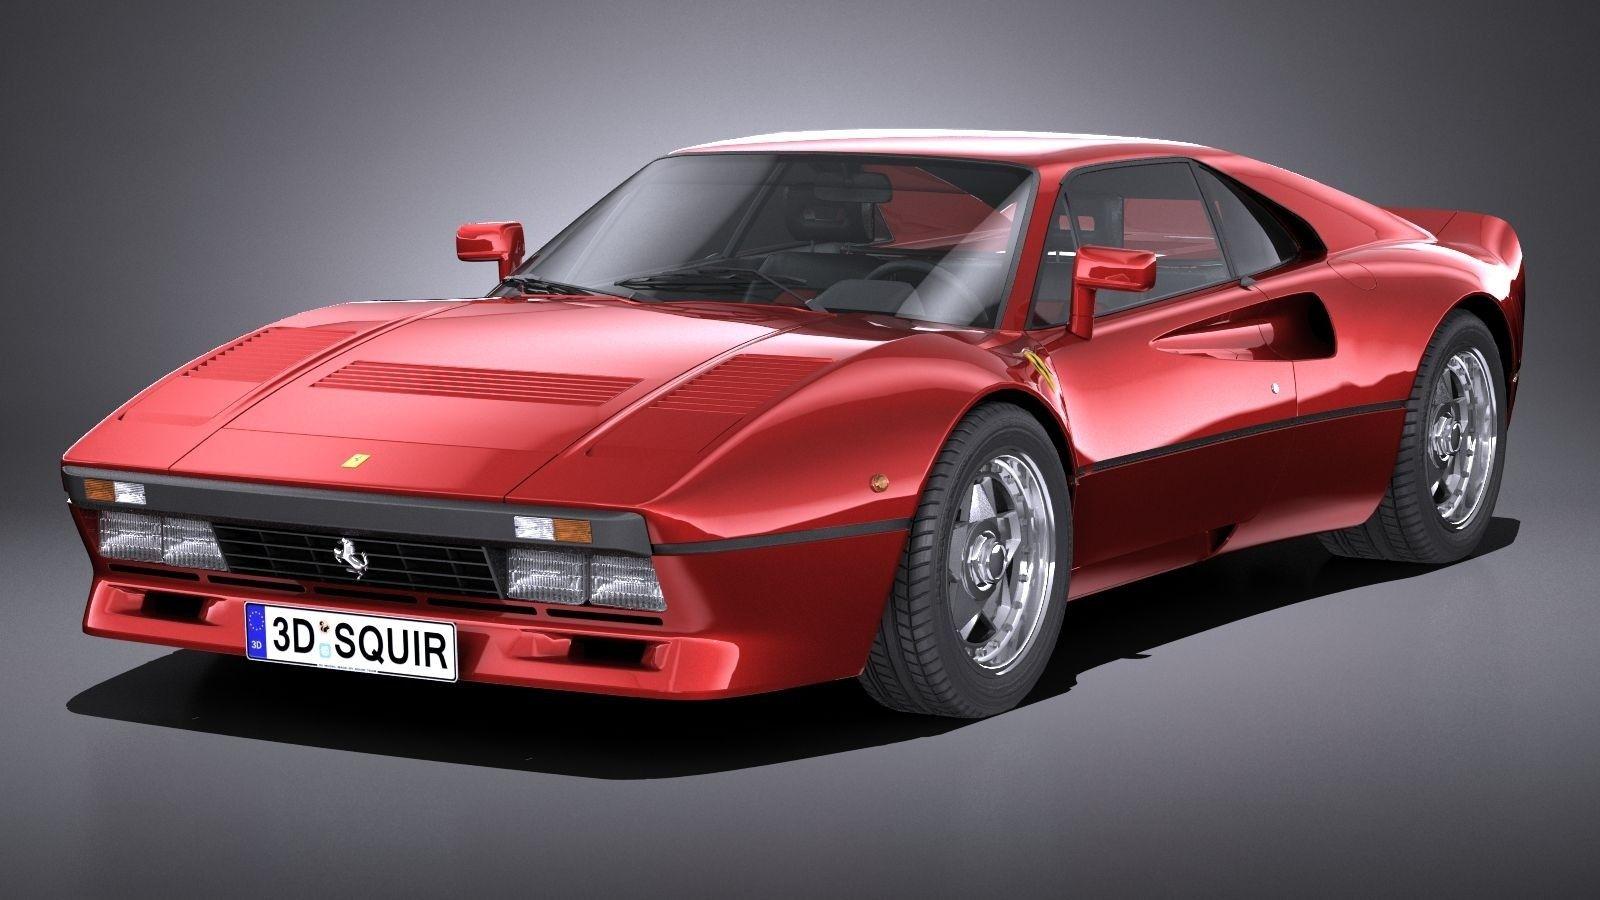 Lowpoly Ferrari 288 Gto 1984 1987 In 2021 Ferrari 288 Gto Gto Ferrari